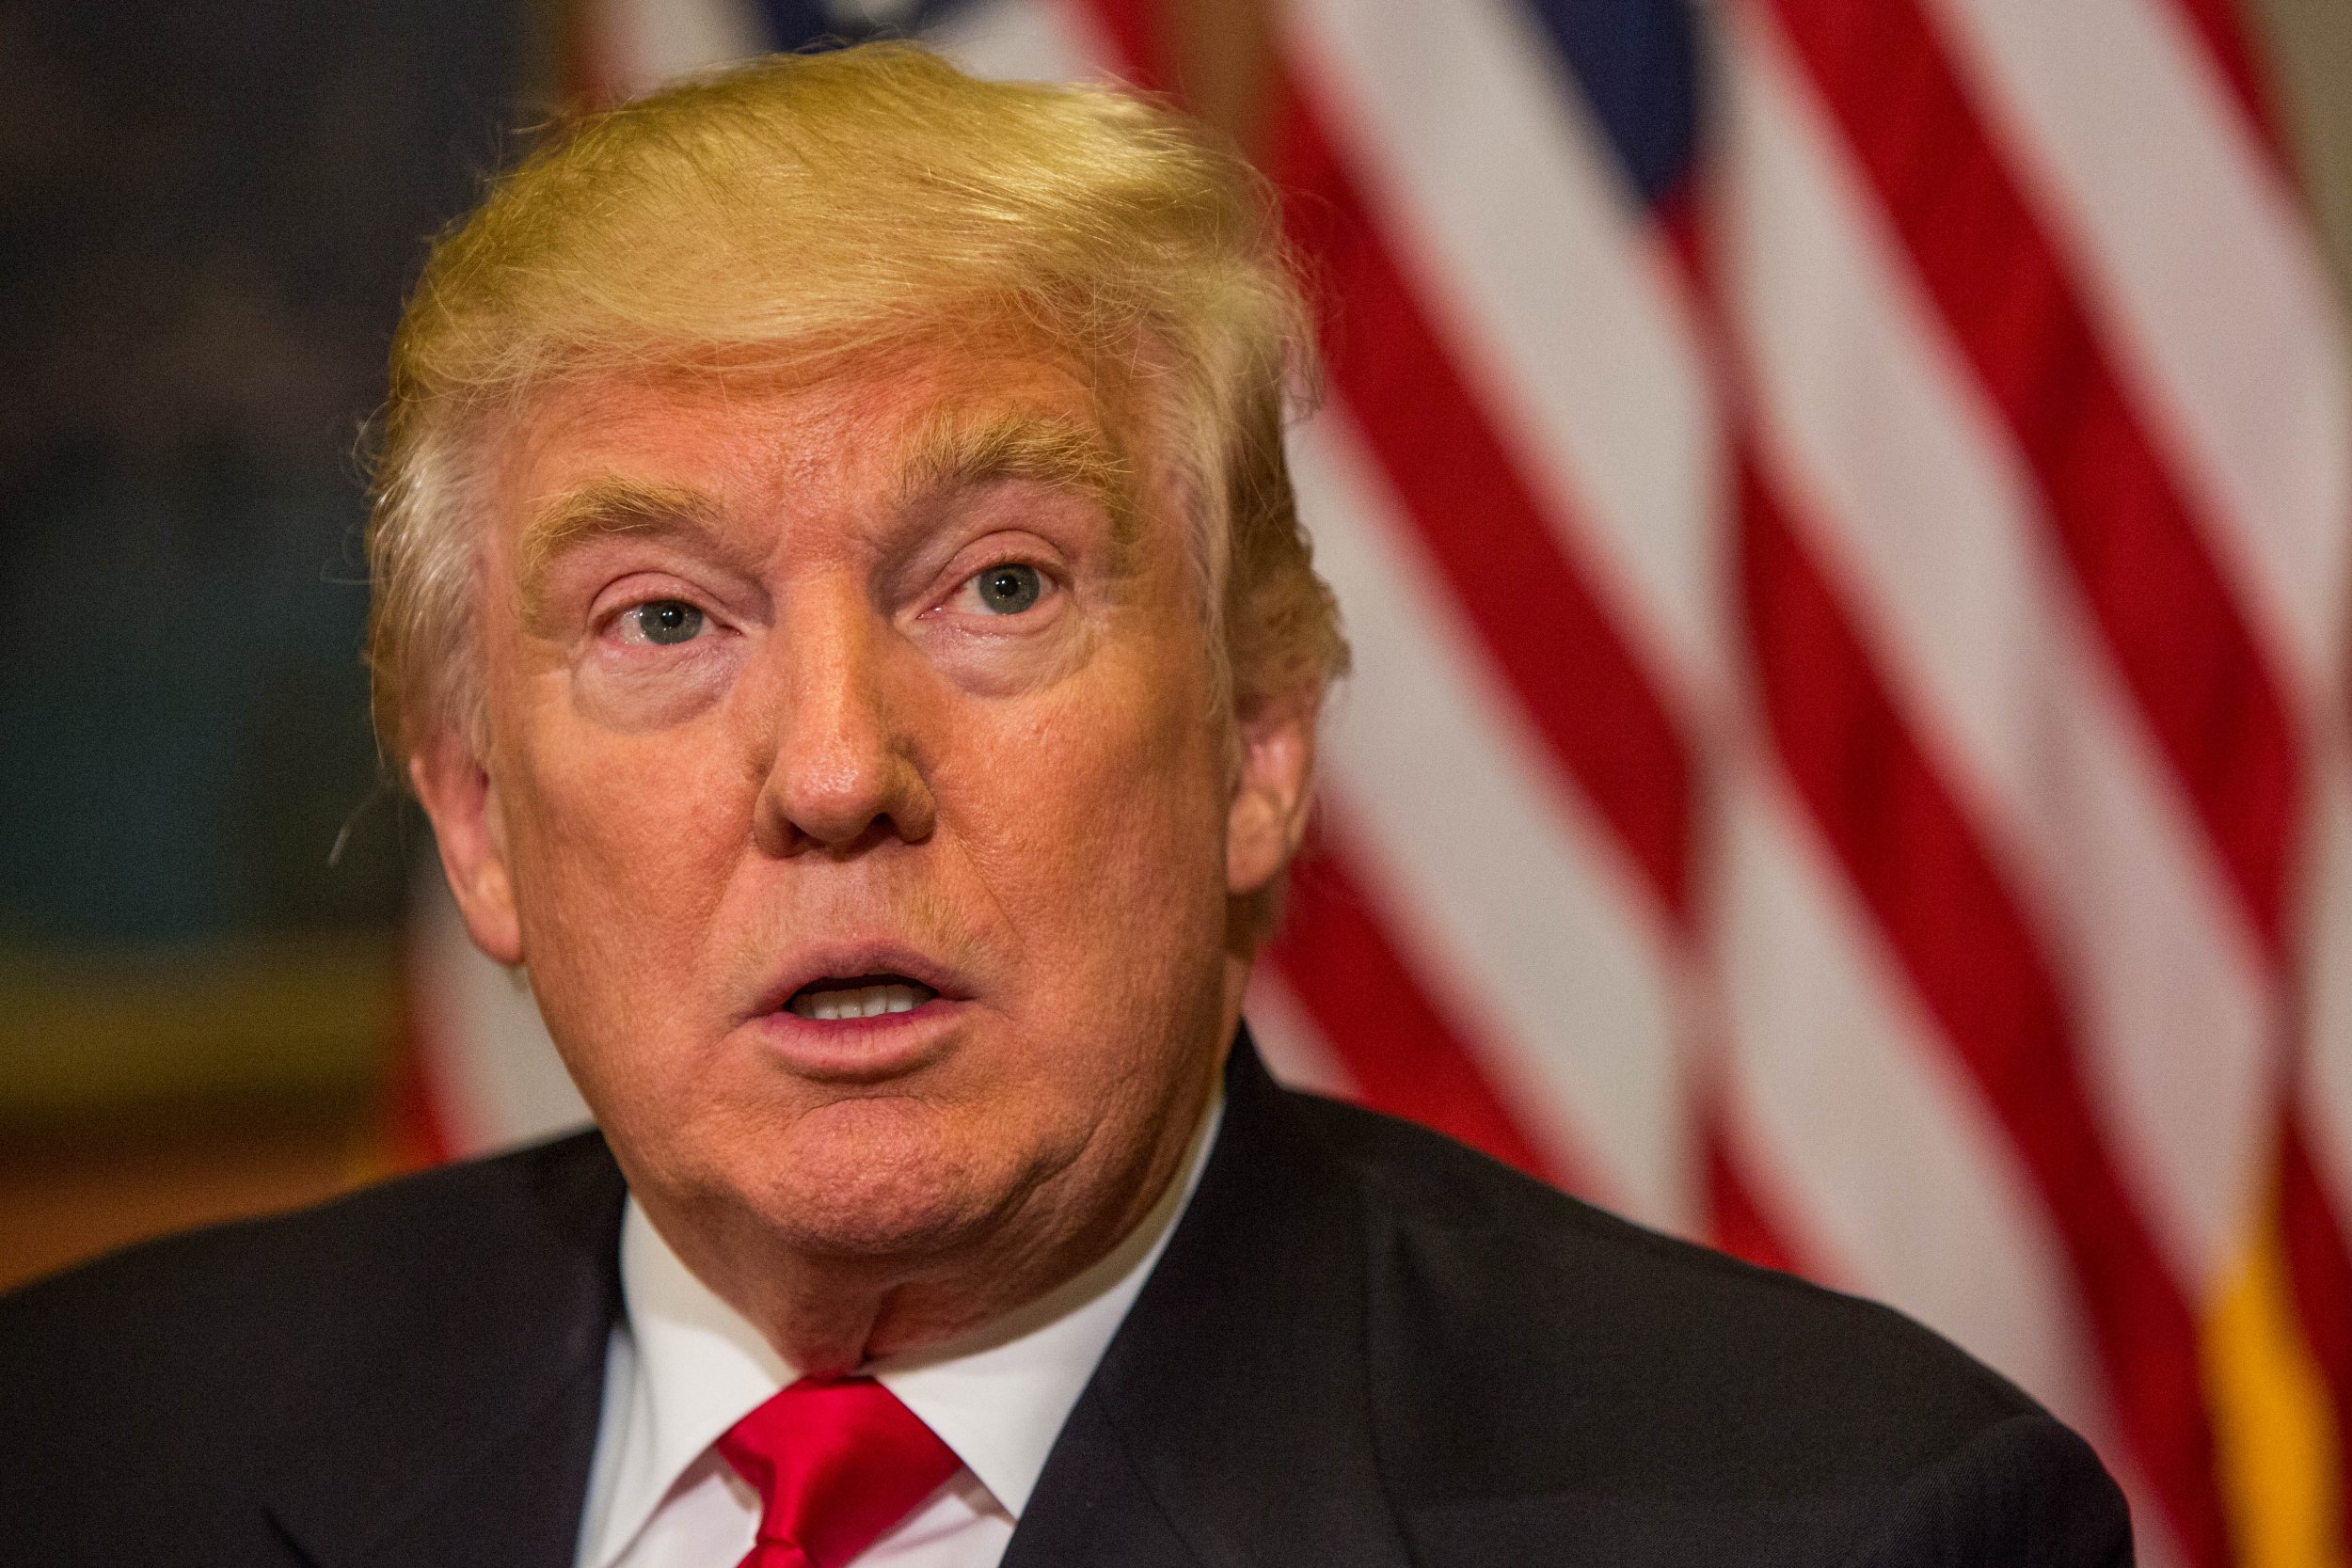 Donald Trump abortion